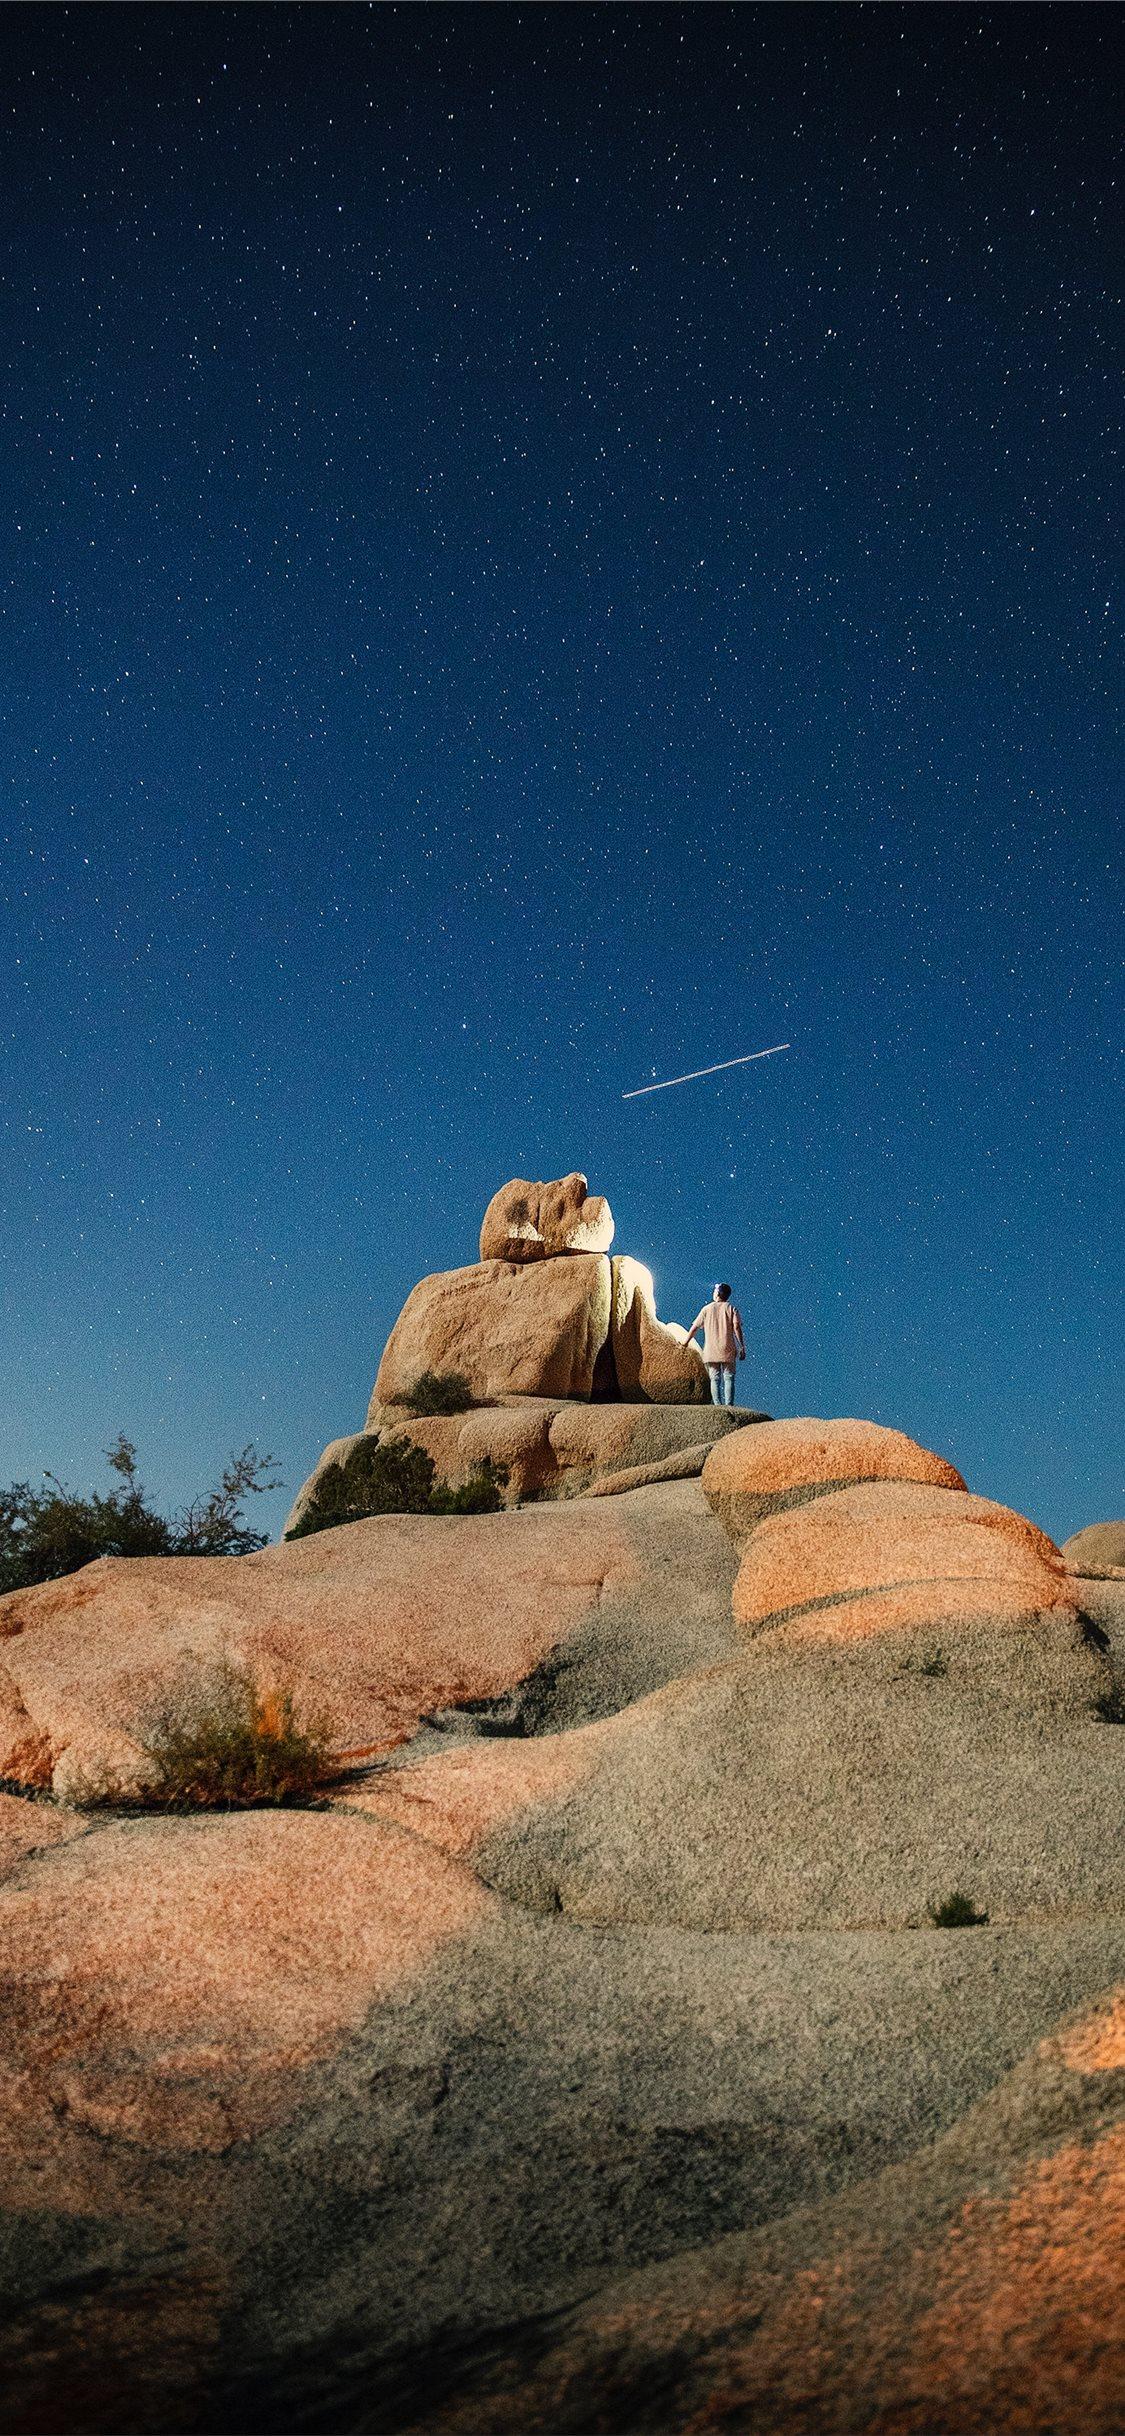 Best Joshua Tree National Park Iphone X Wallpapers Hd 2020 Ilikewallpaper